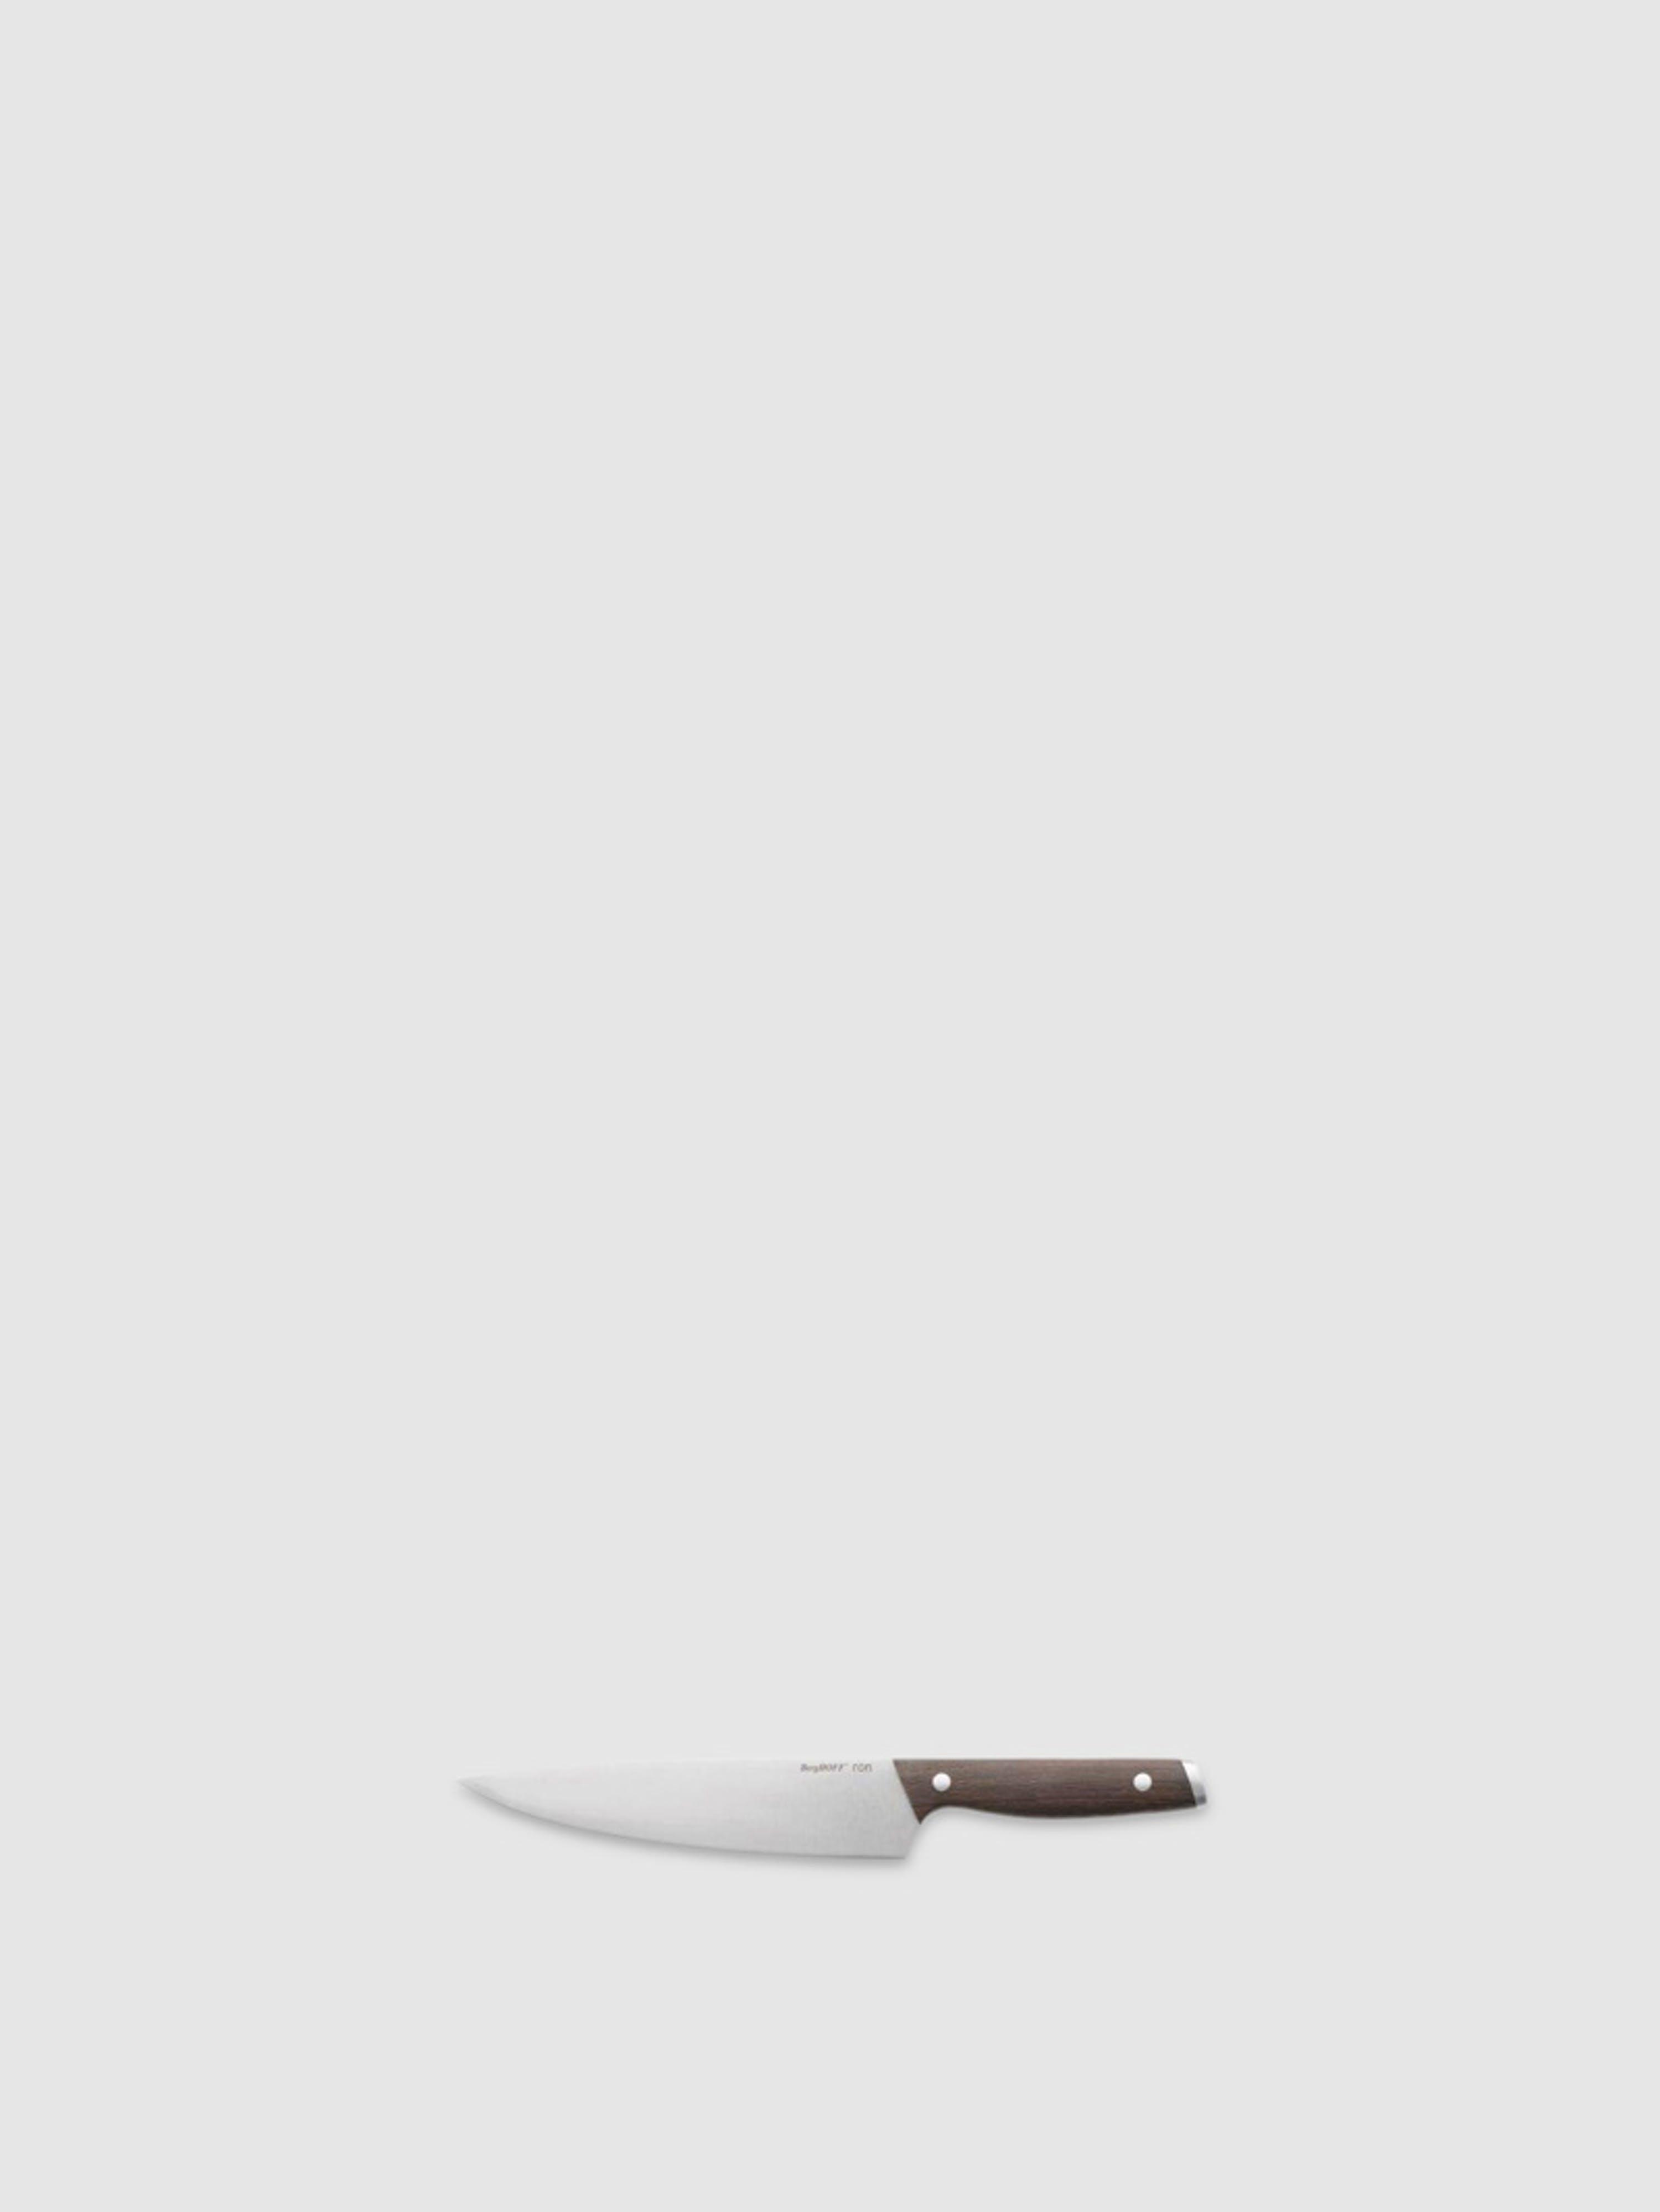 "Berghoff Ron Acapu 8"" Chef's Knife"